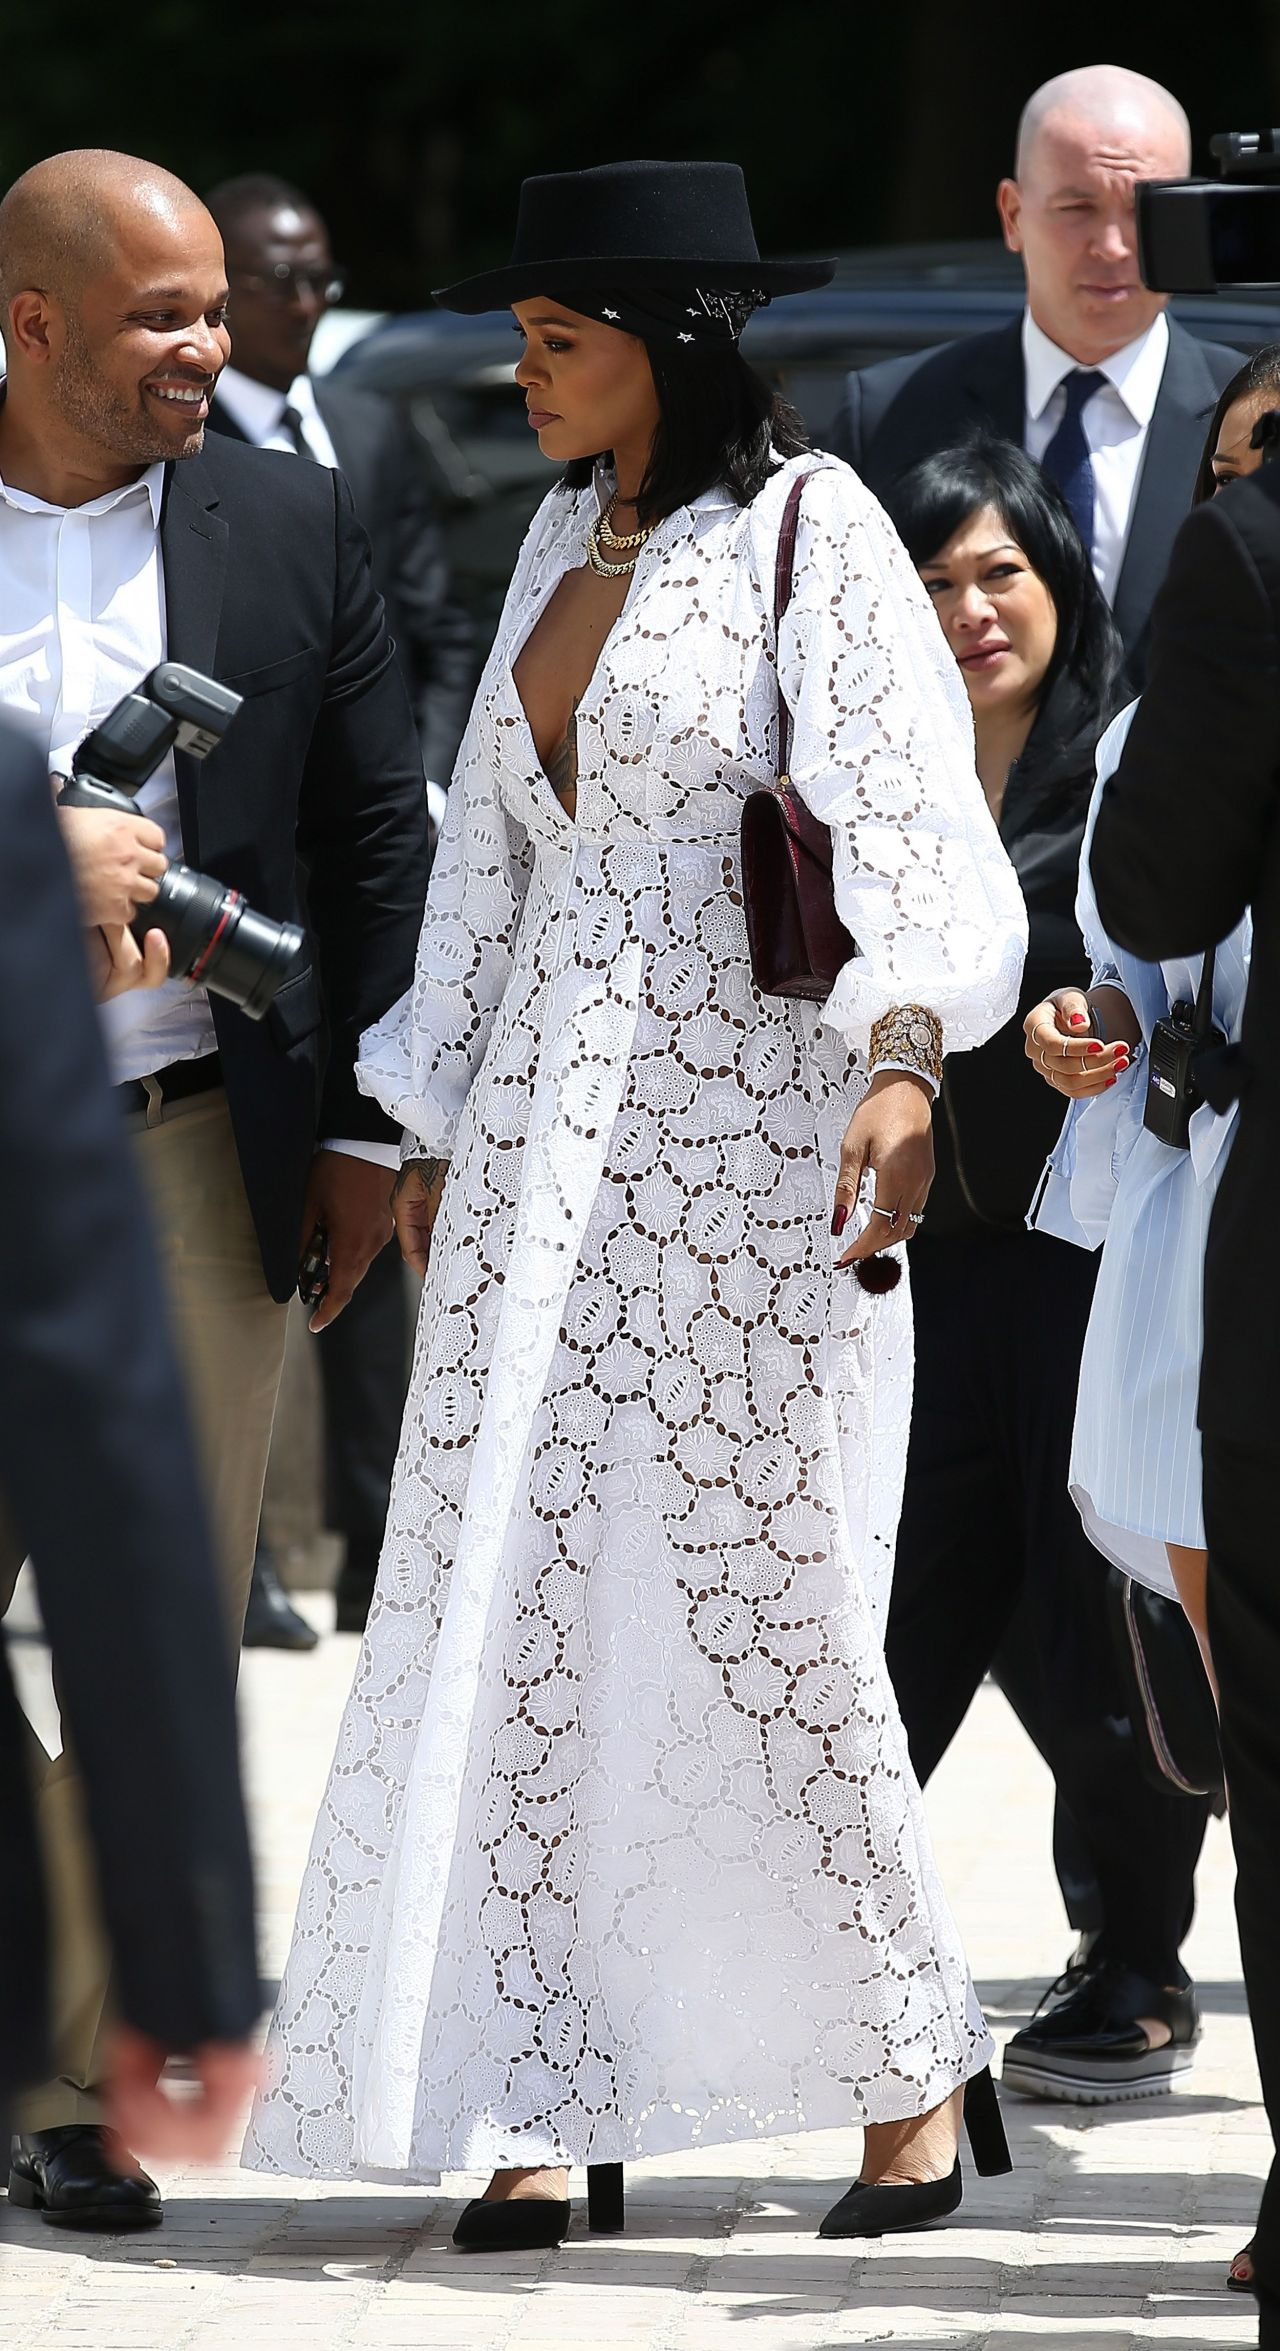 Fashion Designer For Louis Vuitton Salary The Art Of Mike Mignola